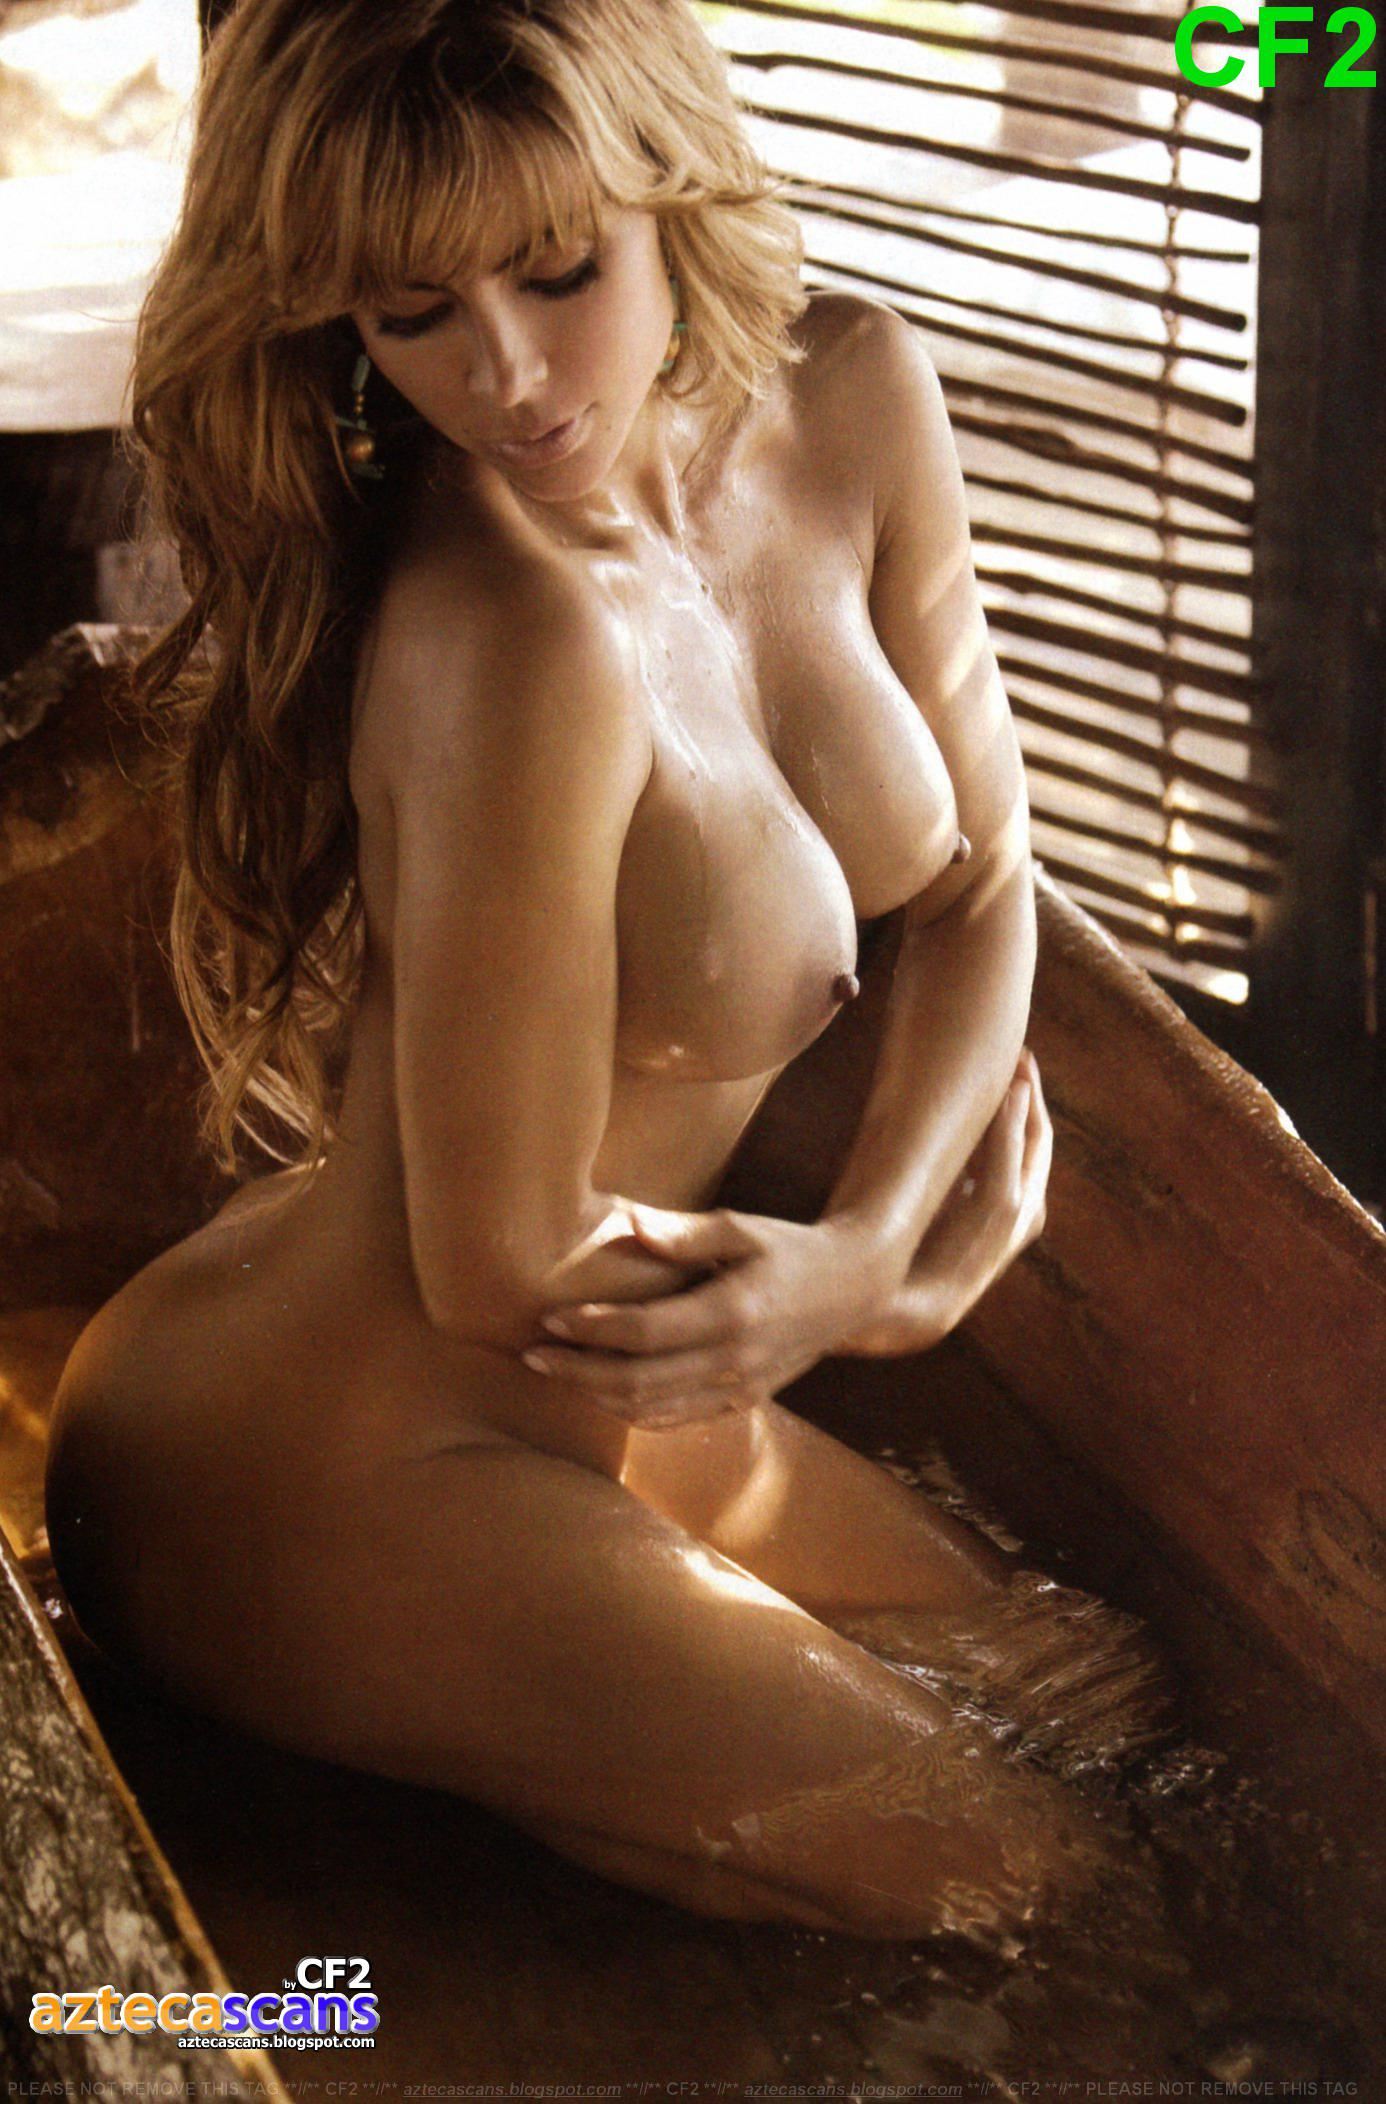 aylin-mujica-pics-nude-naked-nude-twins